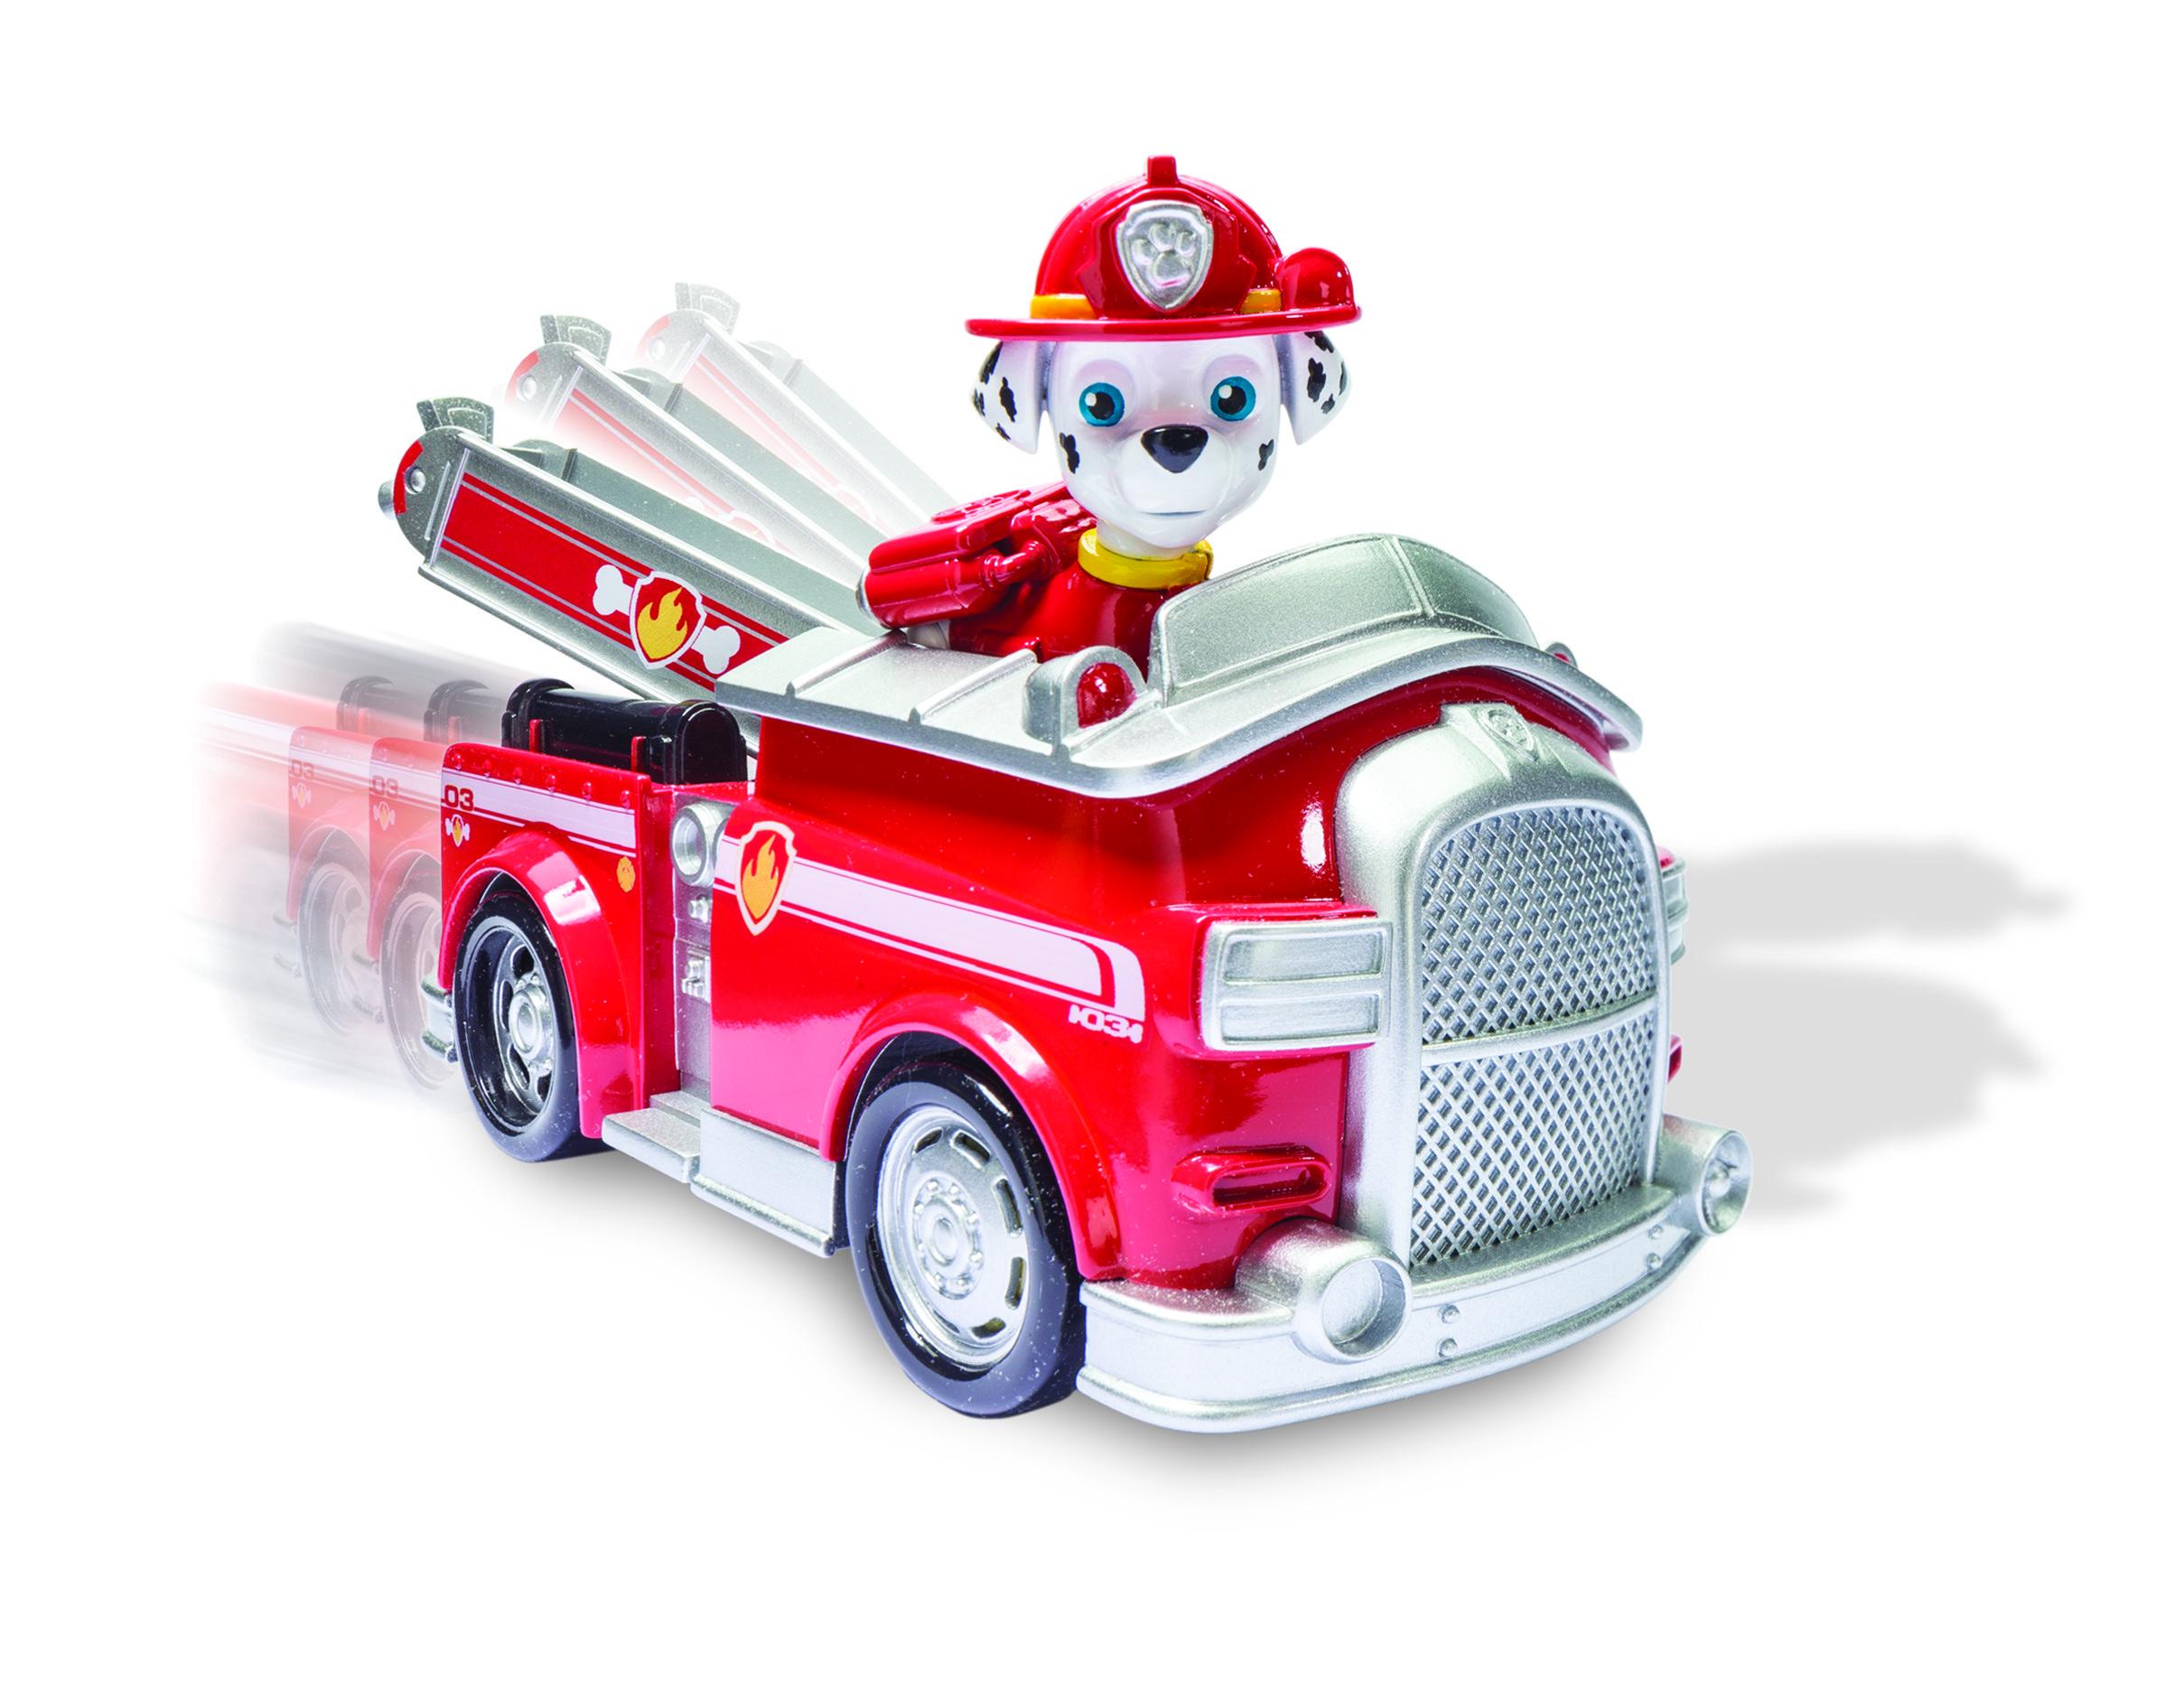 Marshall PAW Patrol Toy